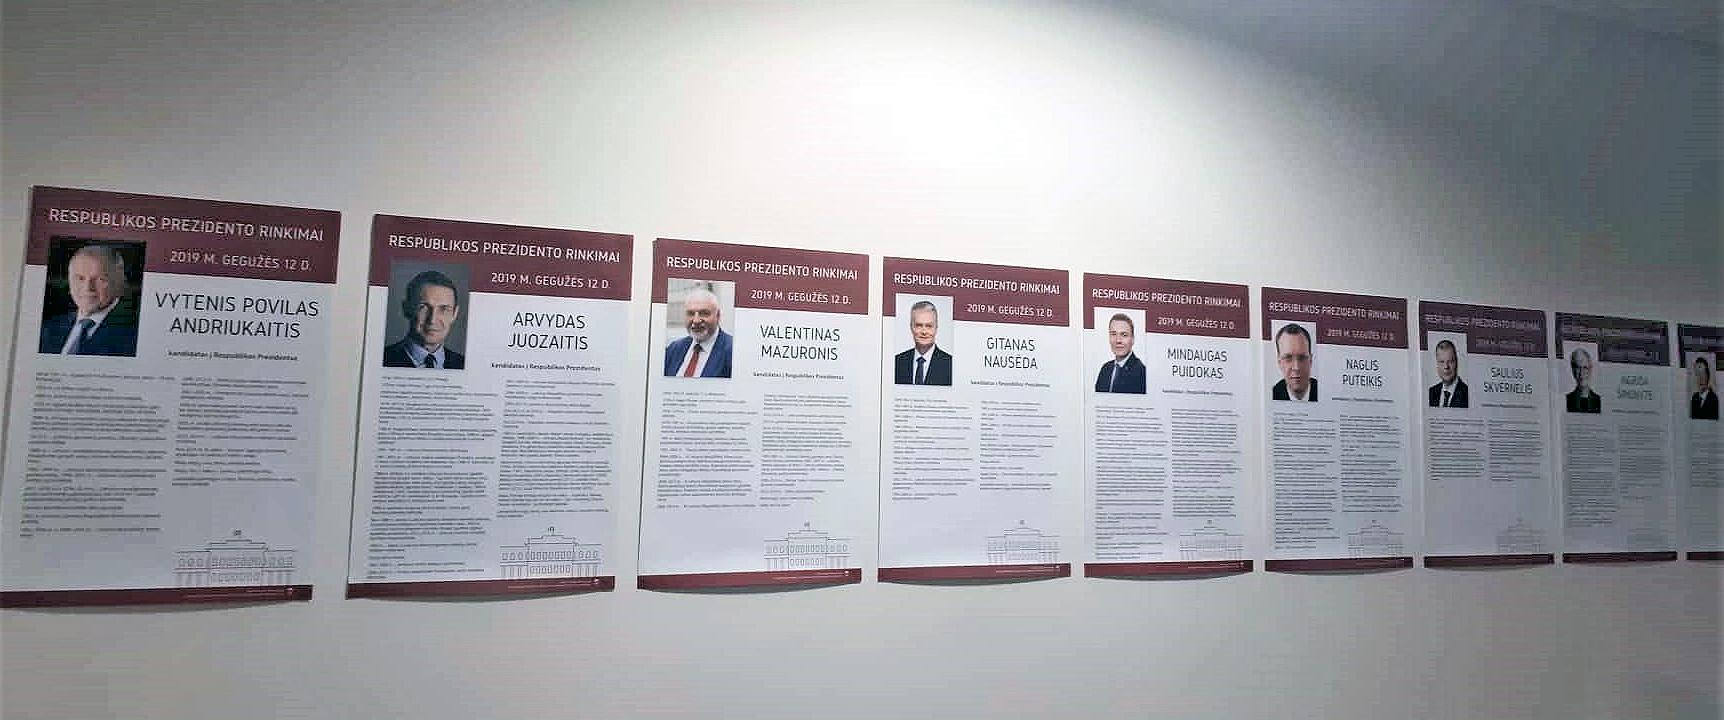 Prezidento rinkimai 2019-05-12   Alkas.lt nuotr.